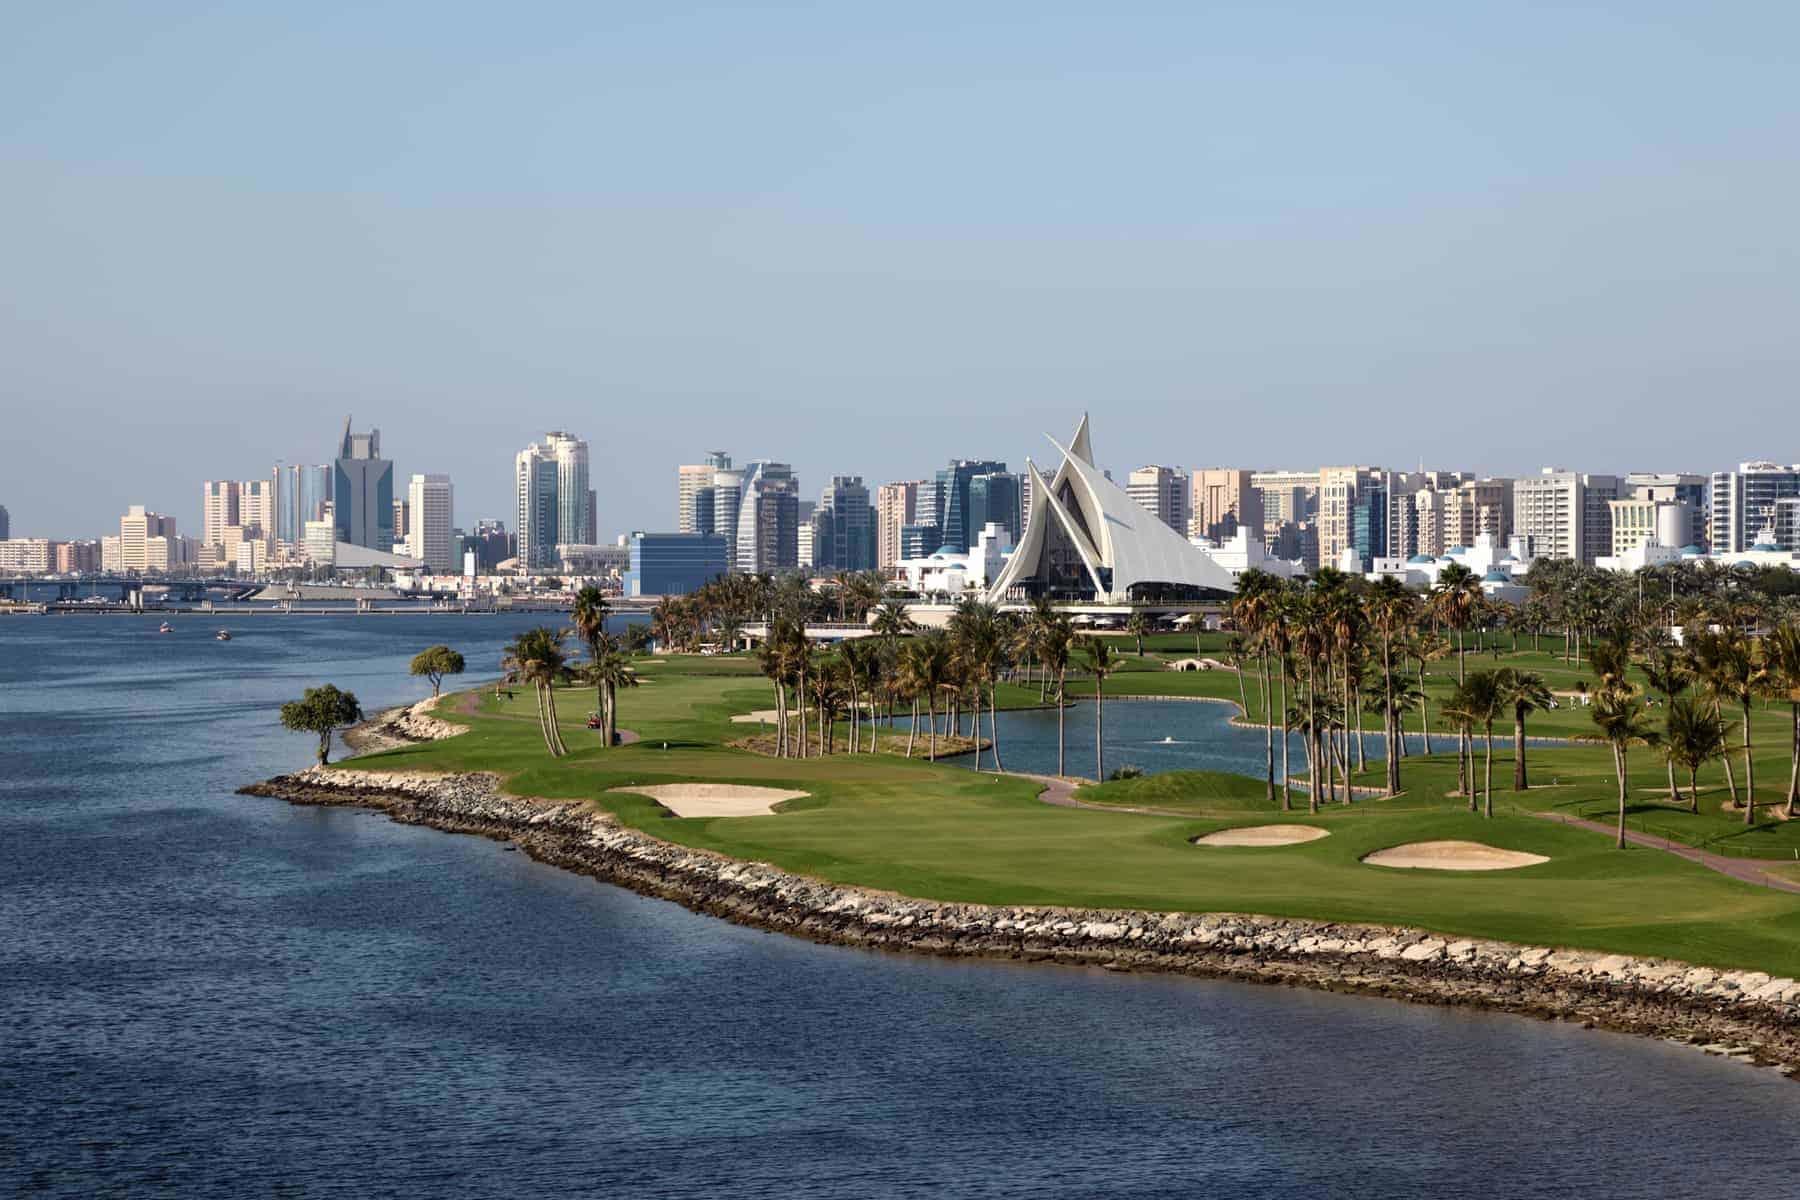 Dubai Creek Golf Course and Yacht Club. United Arab Emirates